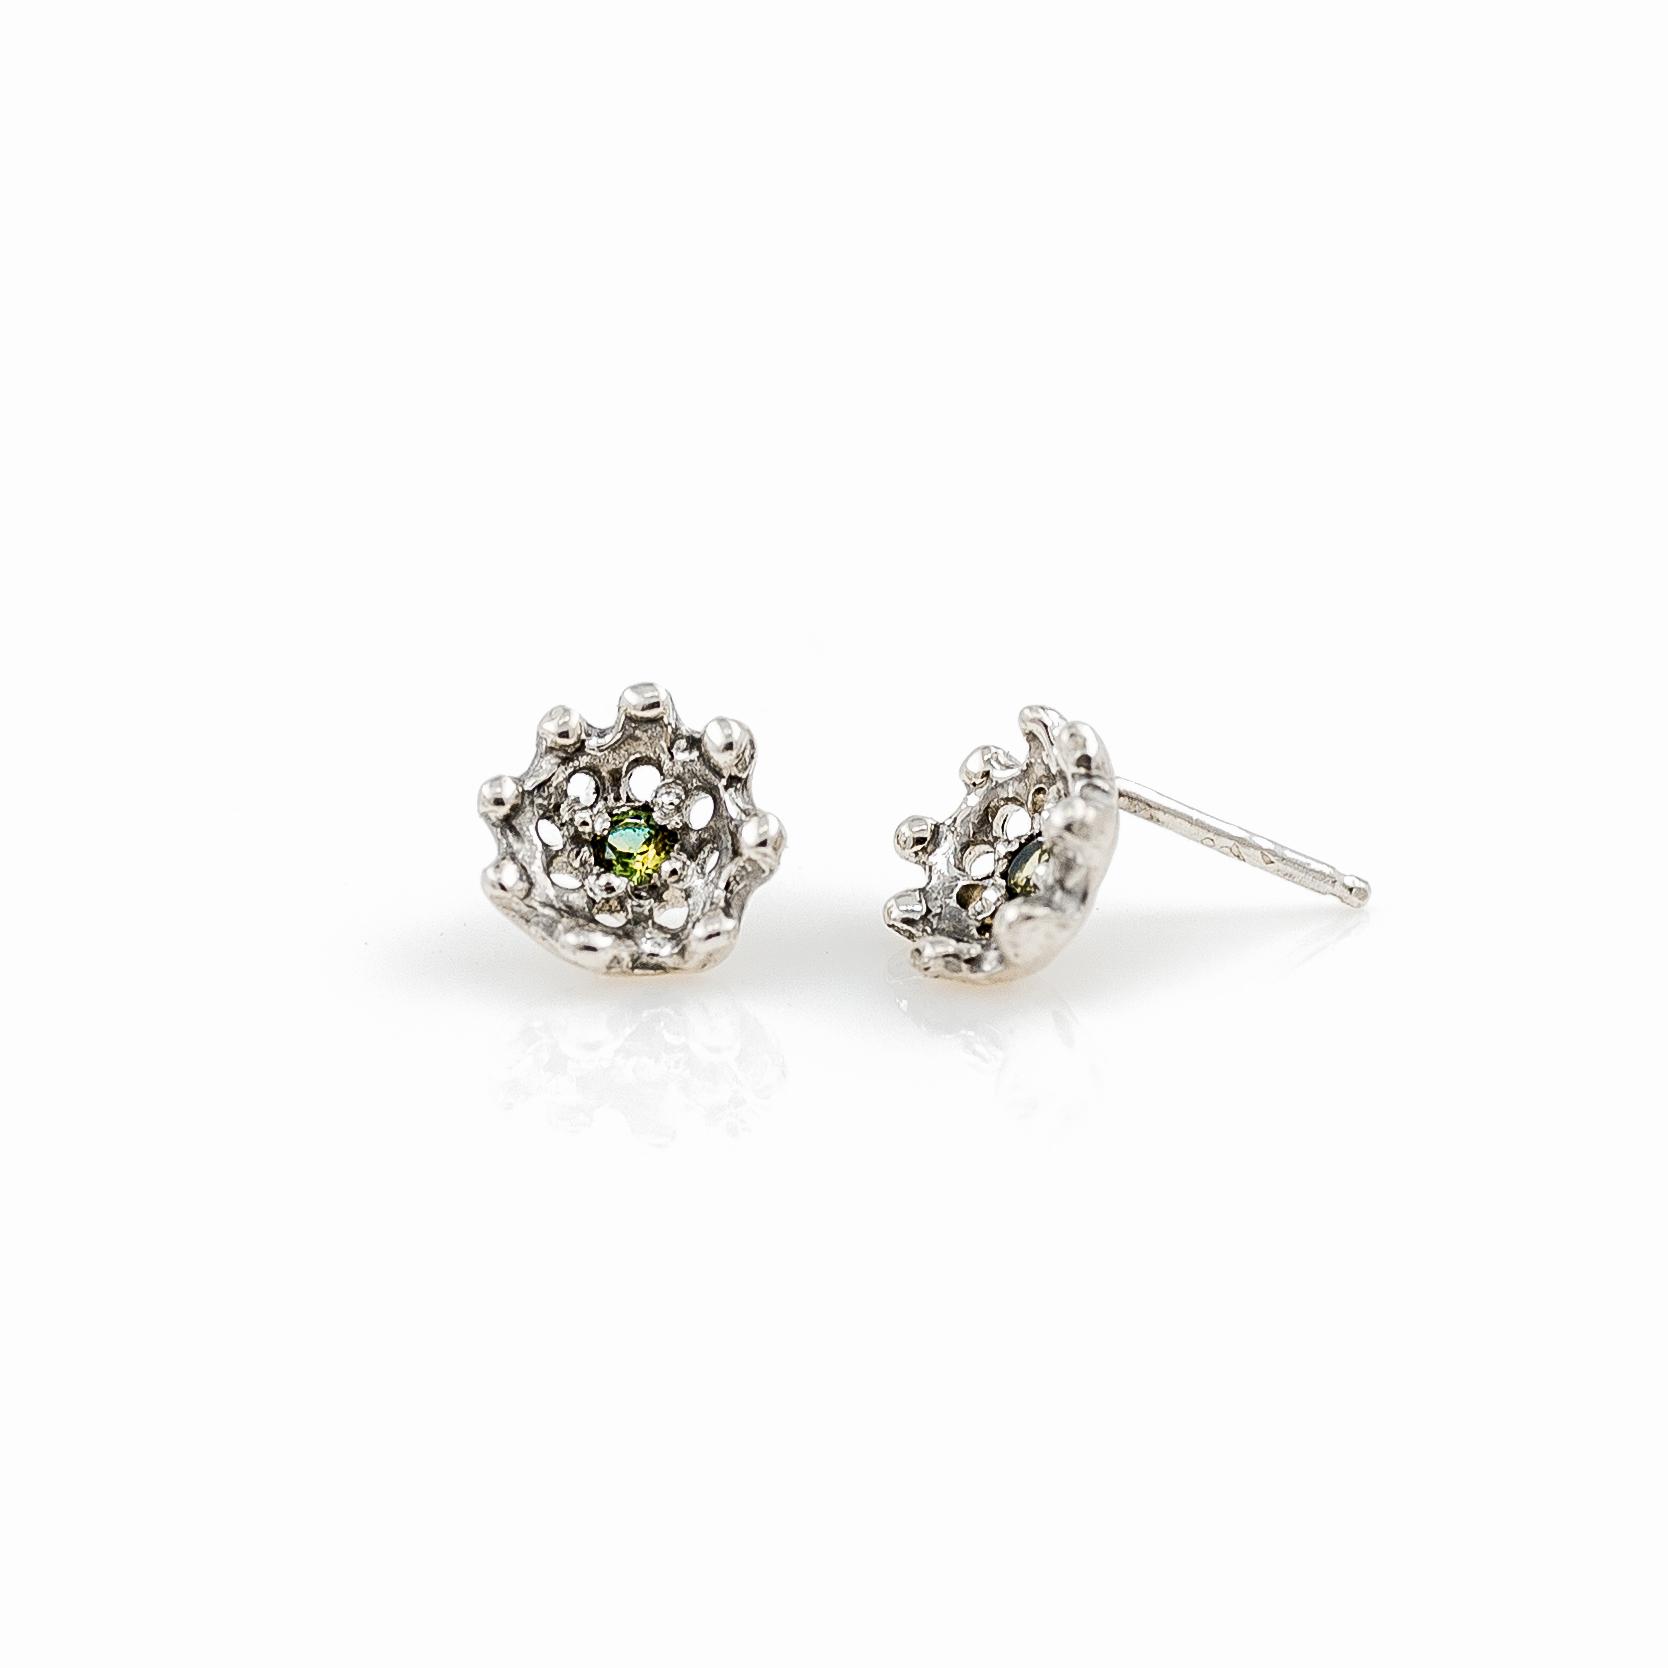 Blue-green Australian sapphires set into oganic silver studs.